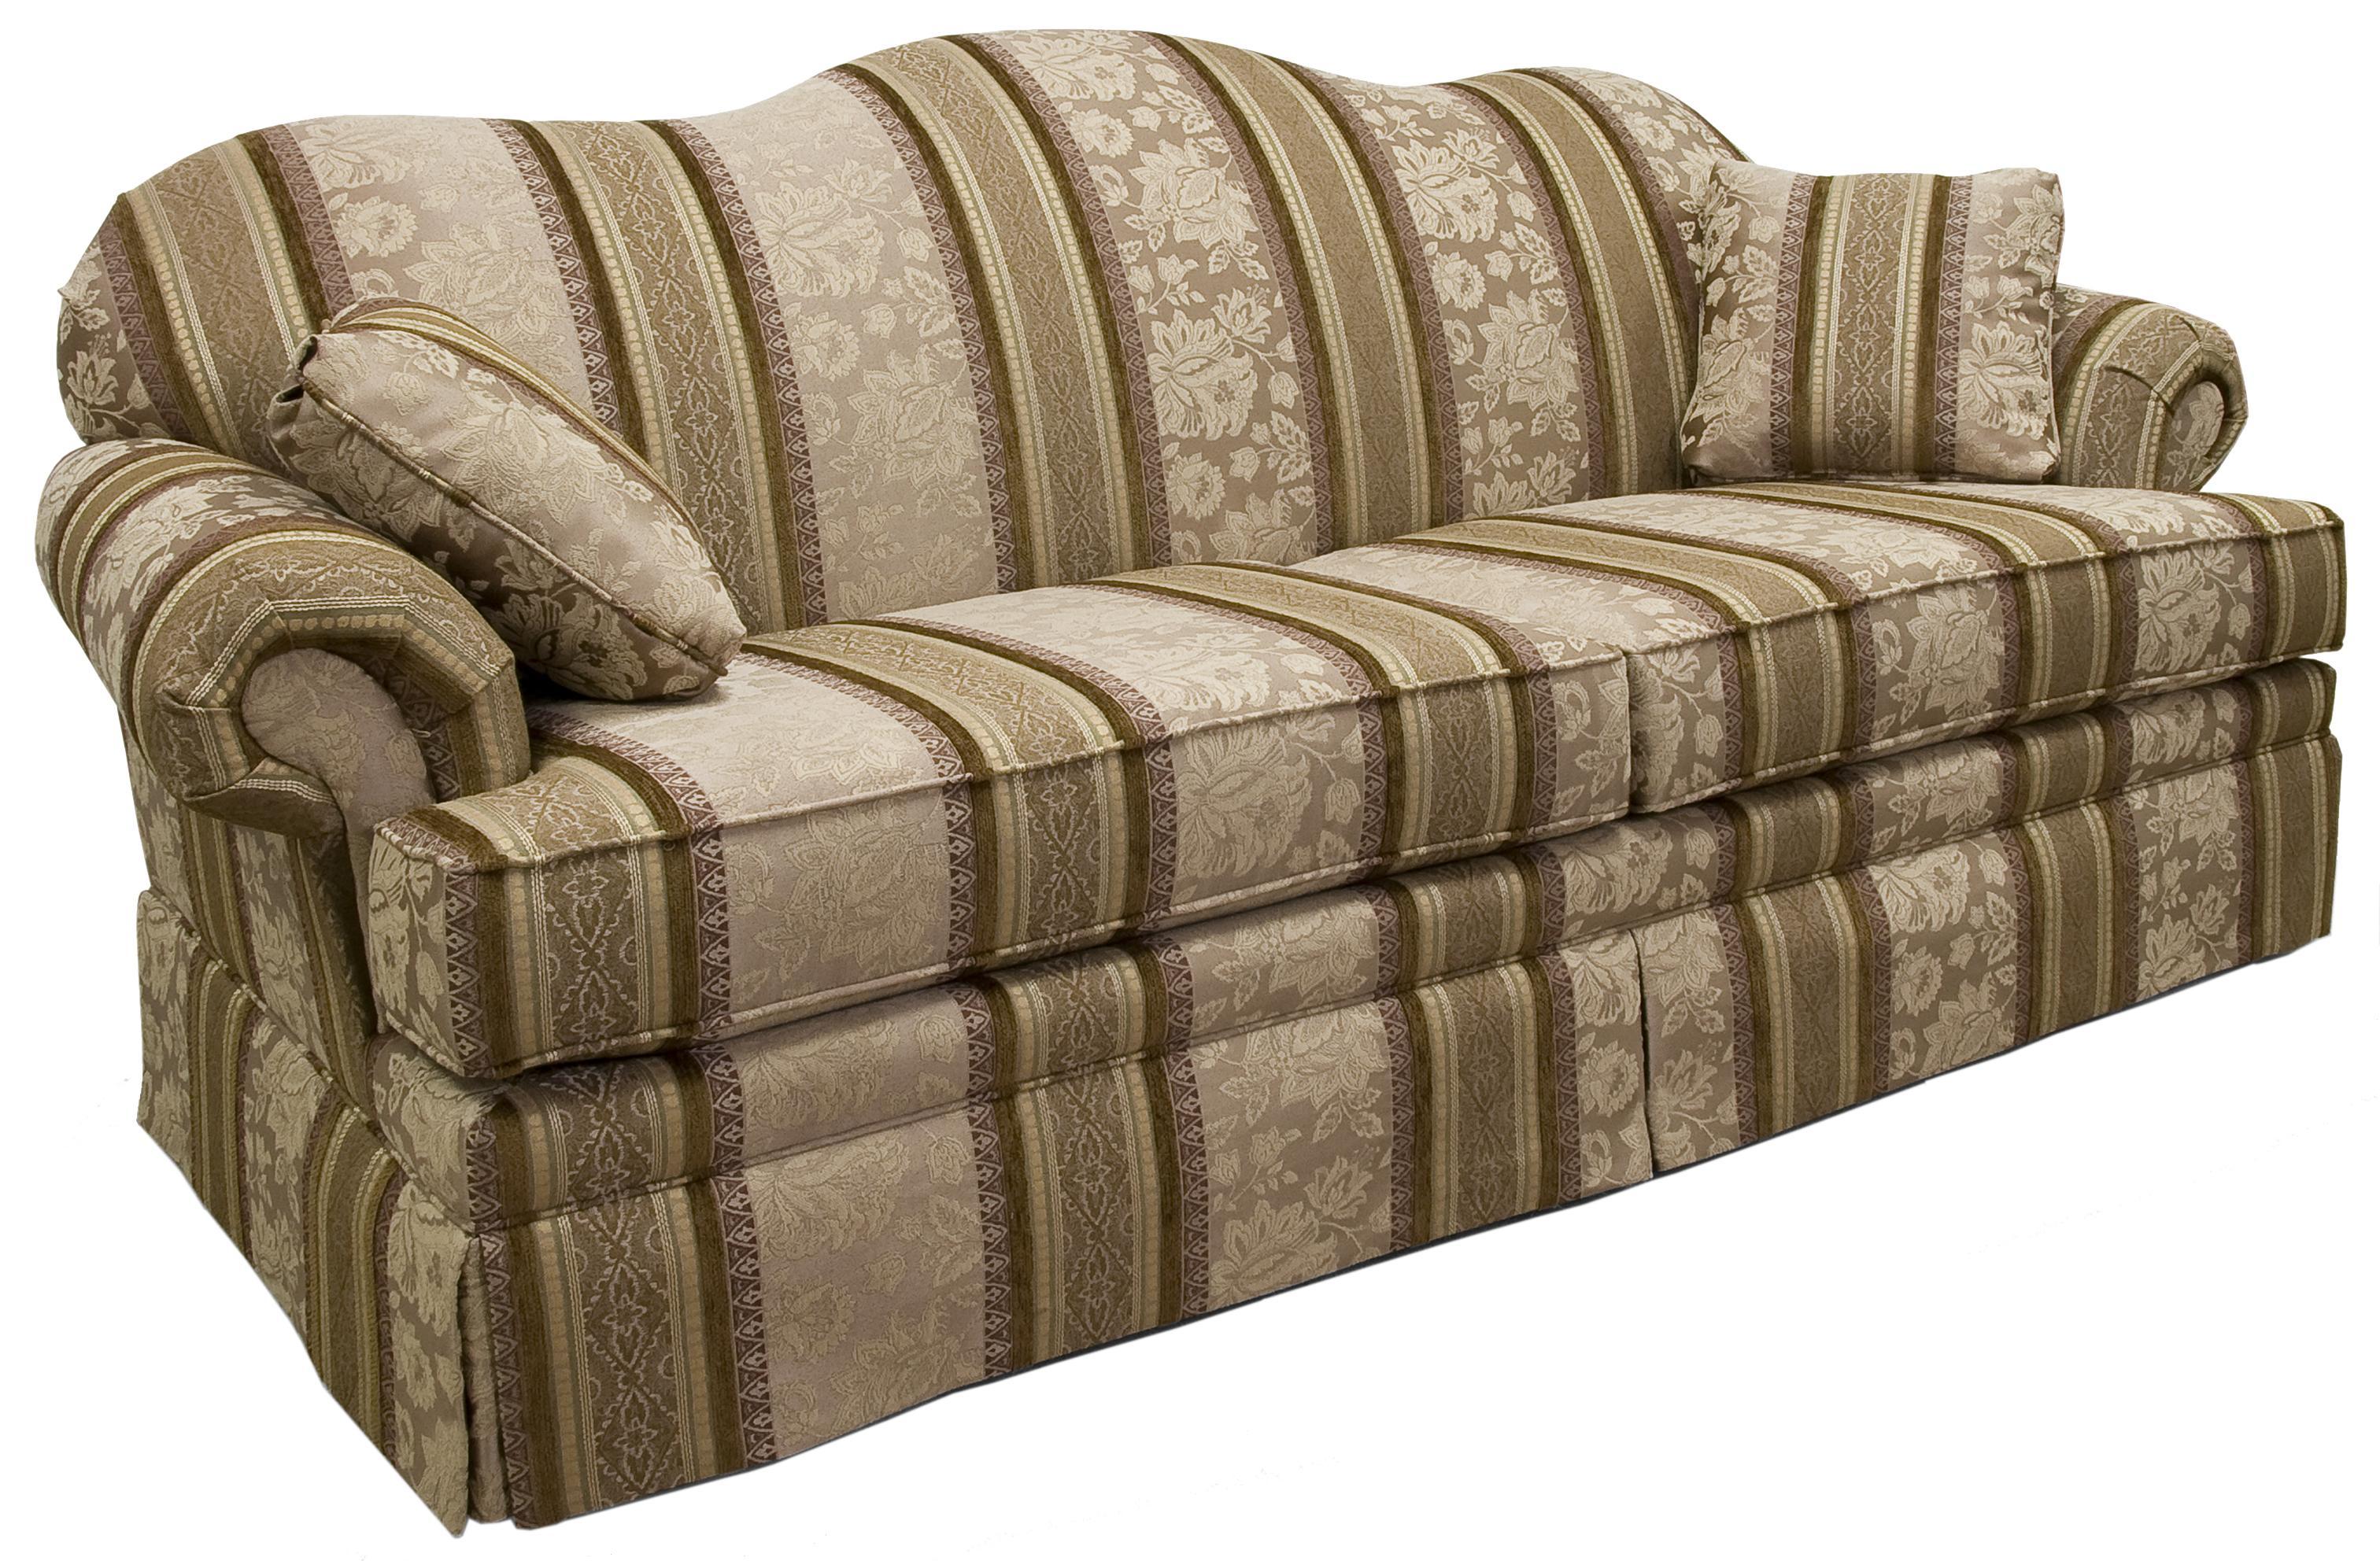 Lancer 3600 Traditional Camelback Sofa With Skirt